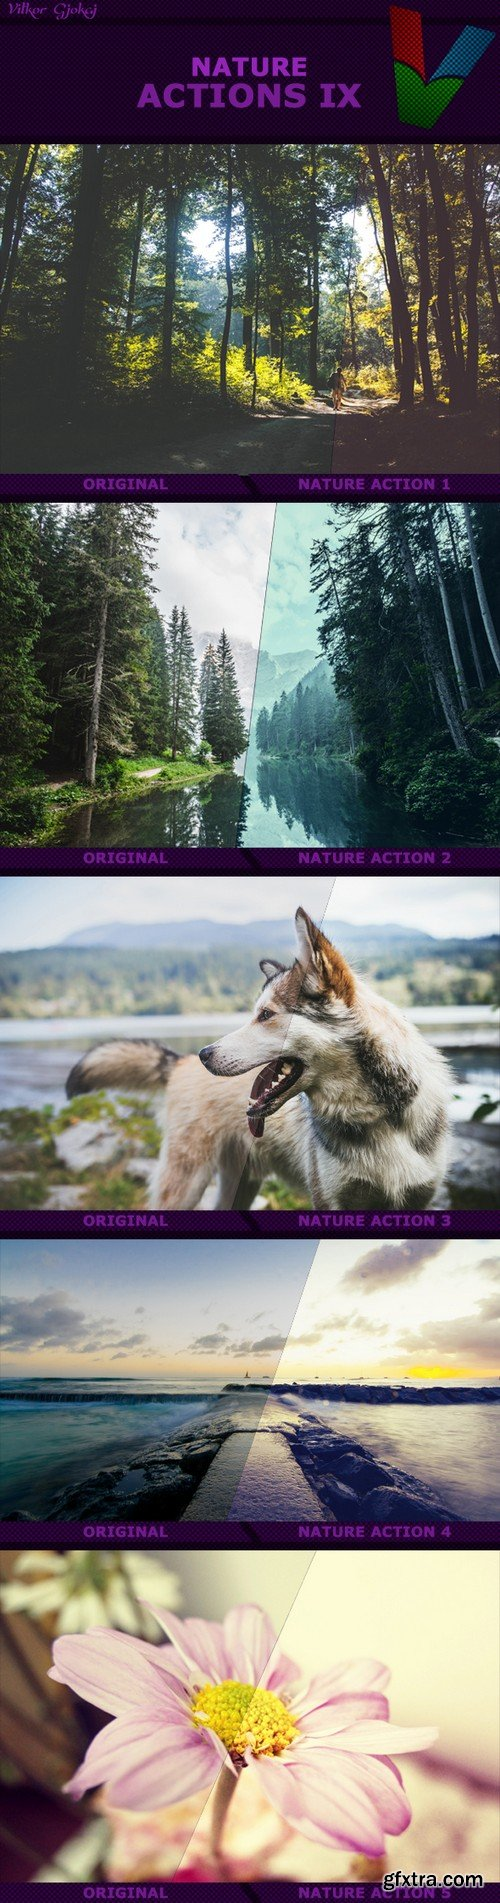 Graphicriver - Nature Actions IX 17929388